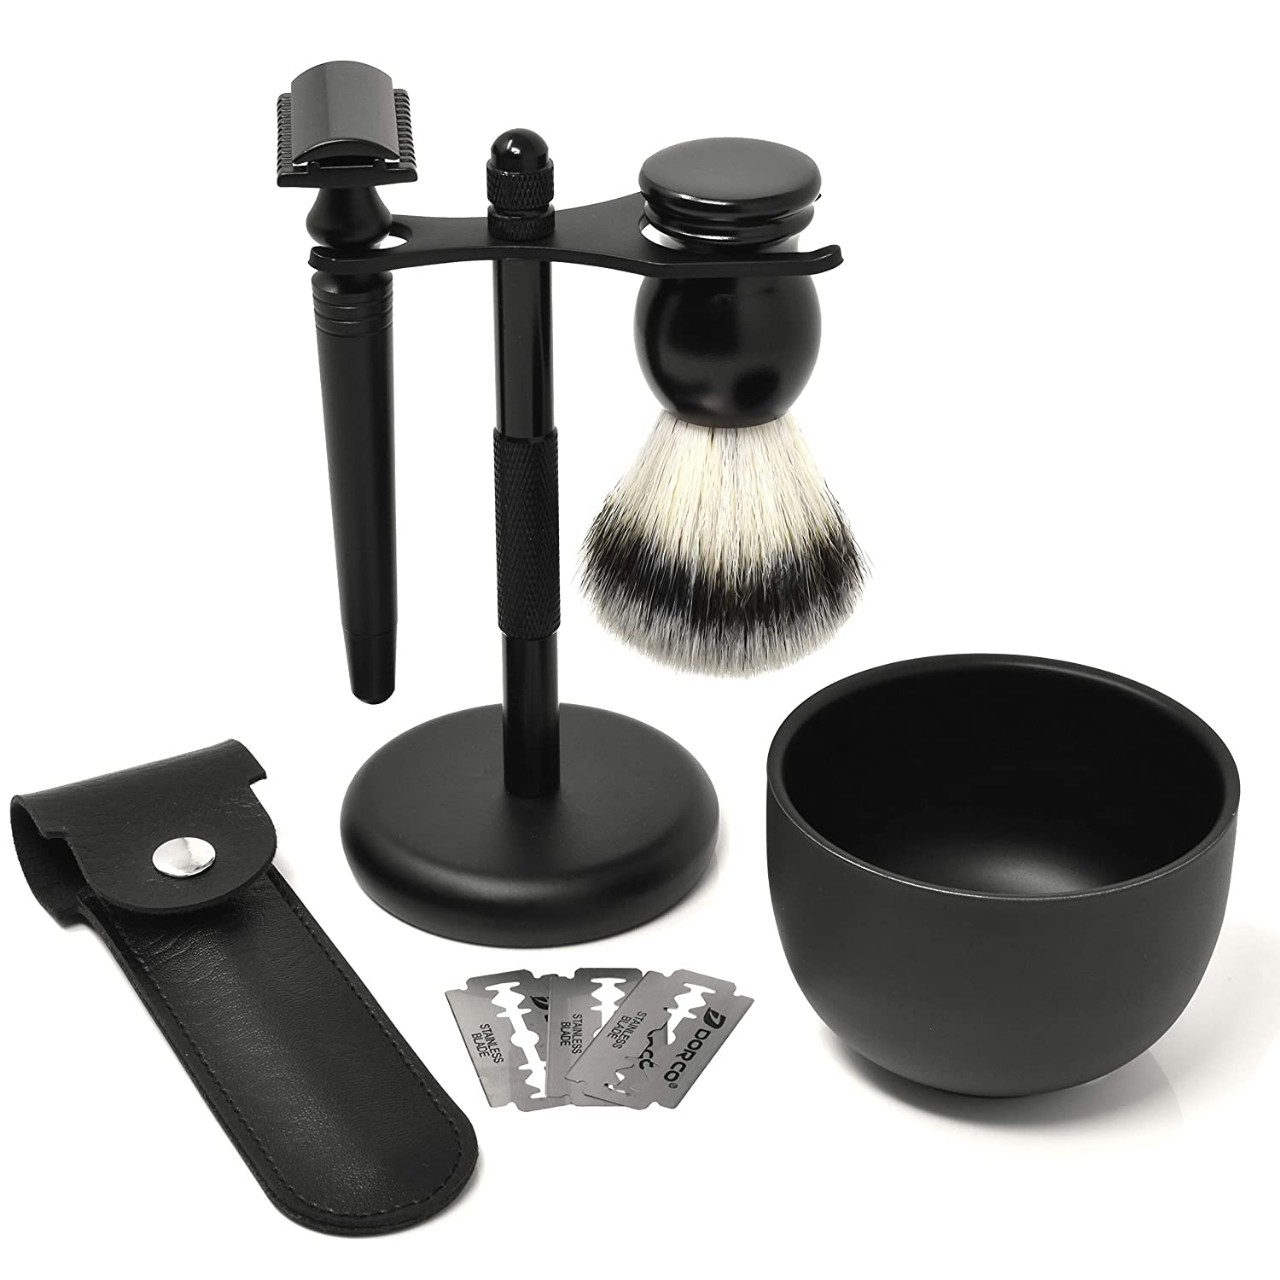 IDALIO Shaving kit for Men Double Edged Safety Razor Gift Set with Shaving Brush, Elegant Razor Case